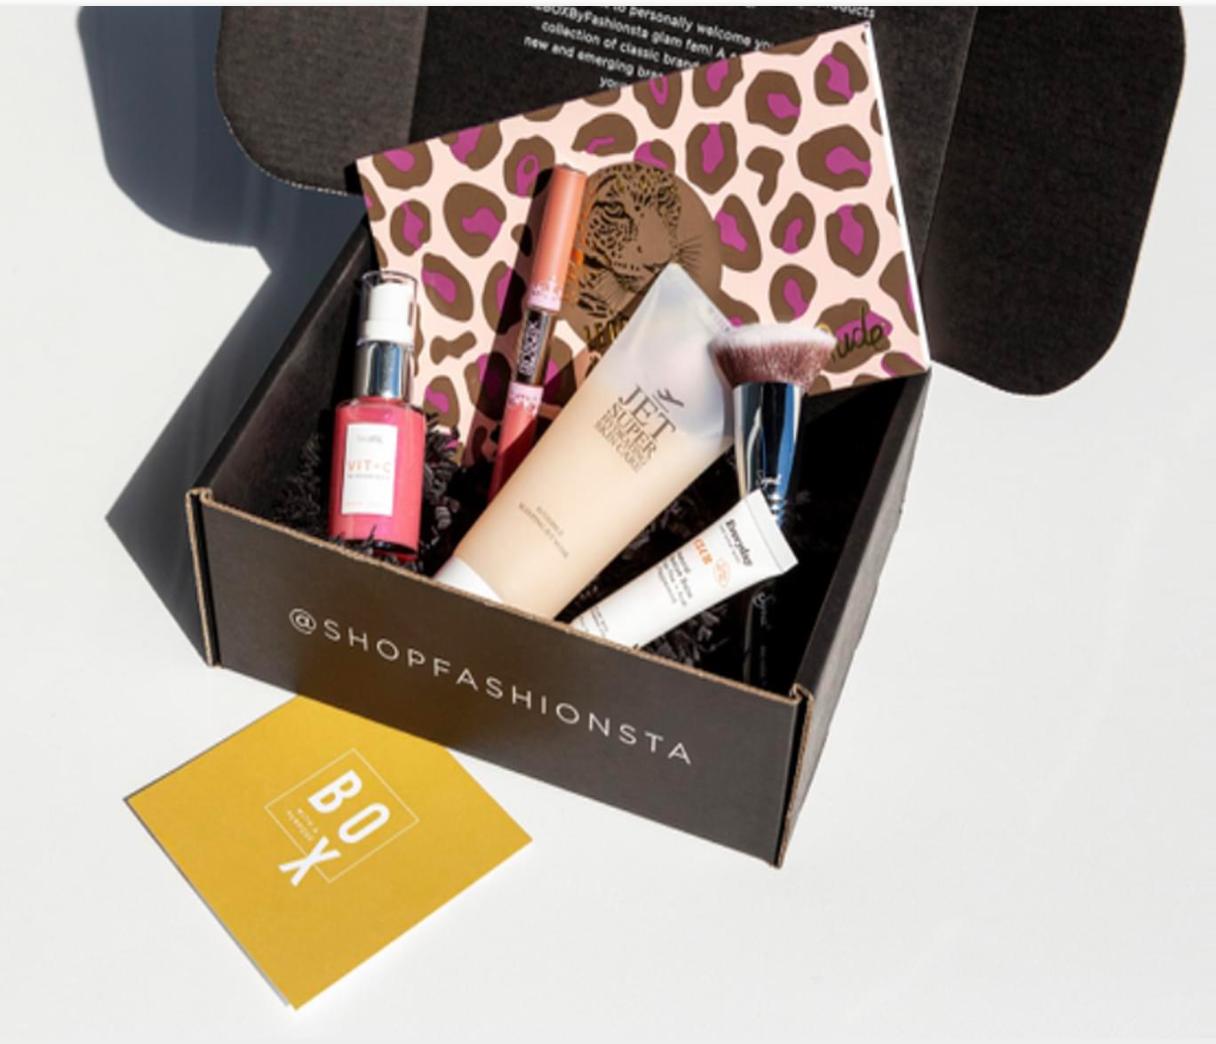 The Box By Fashionsta